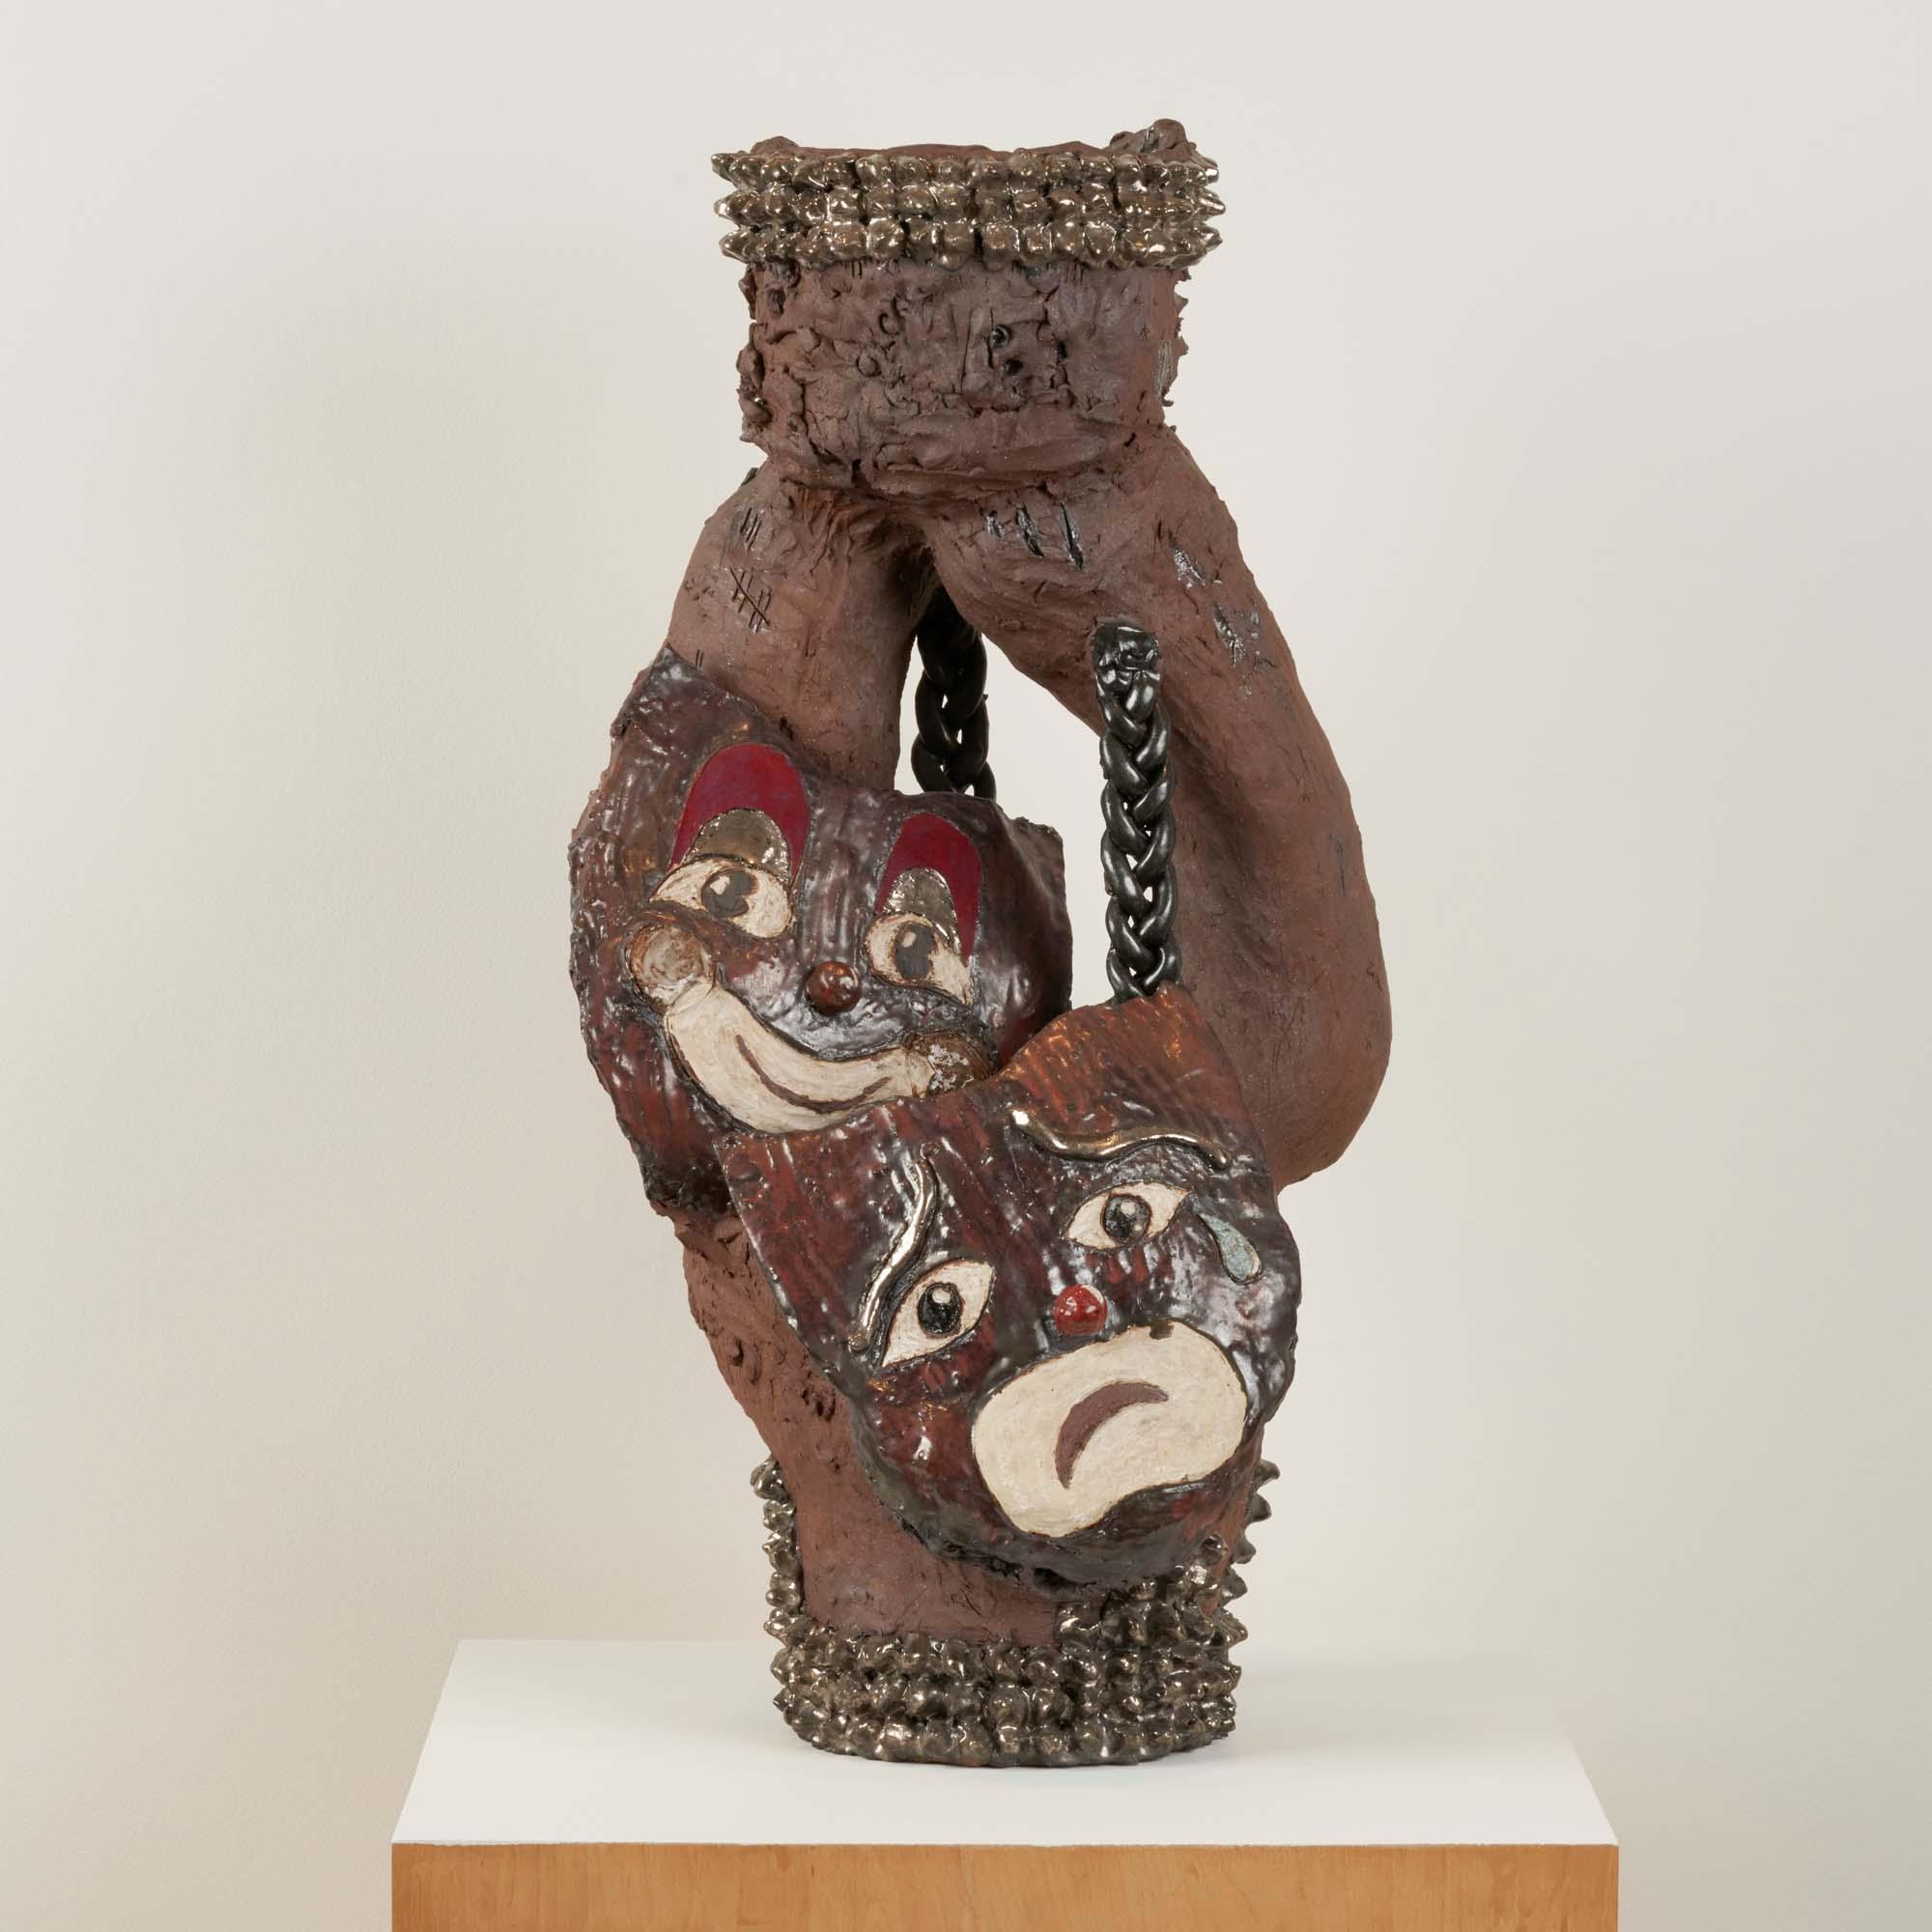 "Image of ceramic sculpture ""Smile Now Cry Later"" by Diana Yesenia Alvarado."